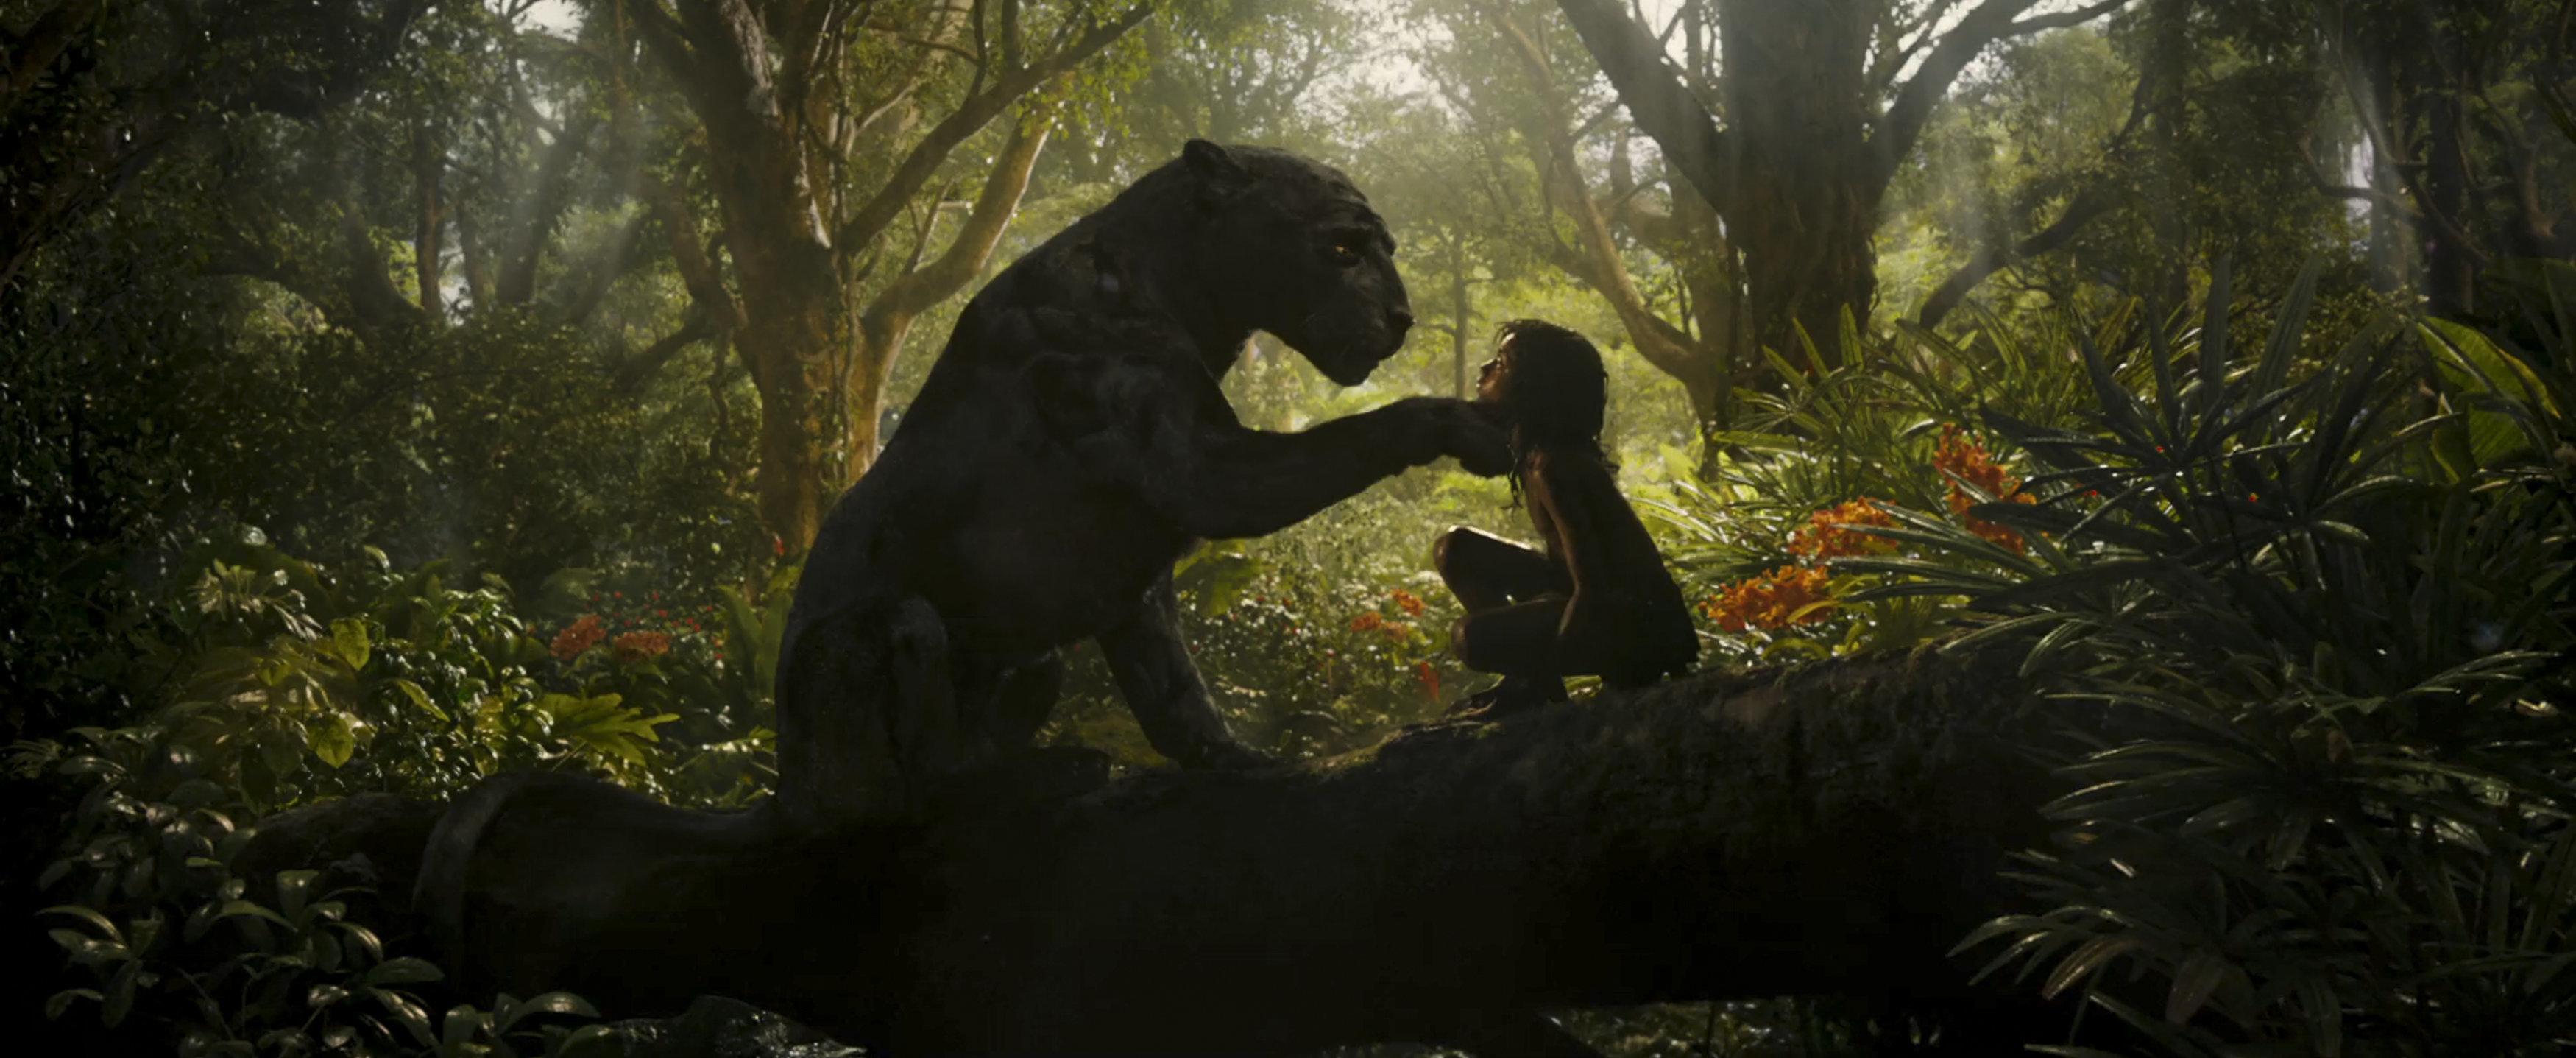 """Mowgli: Legend of the Jungle"" on Netflix."